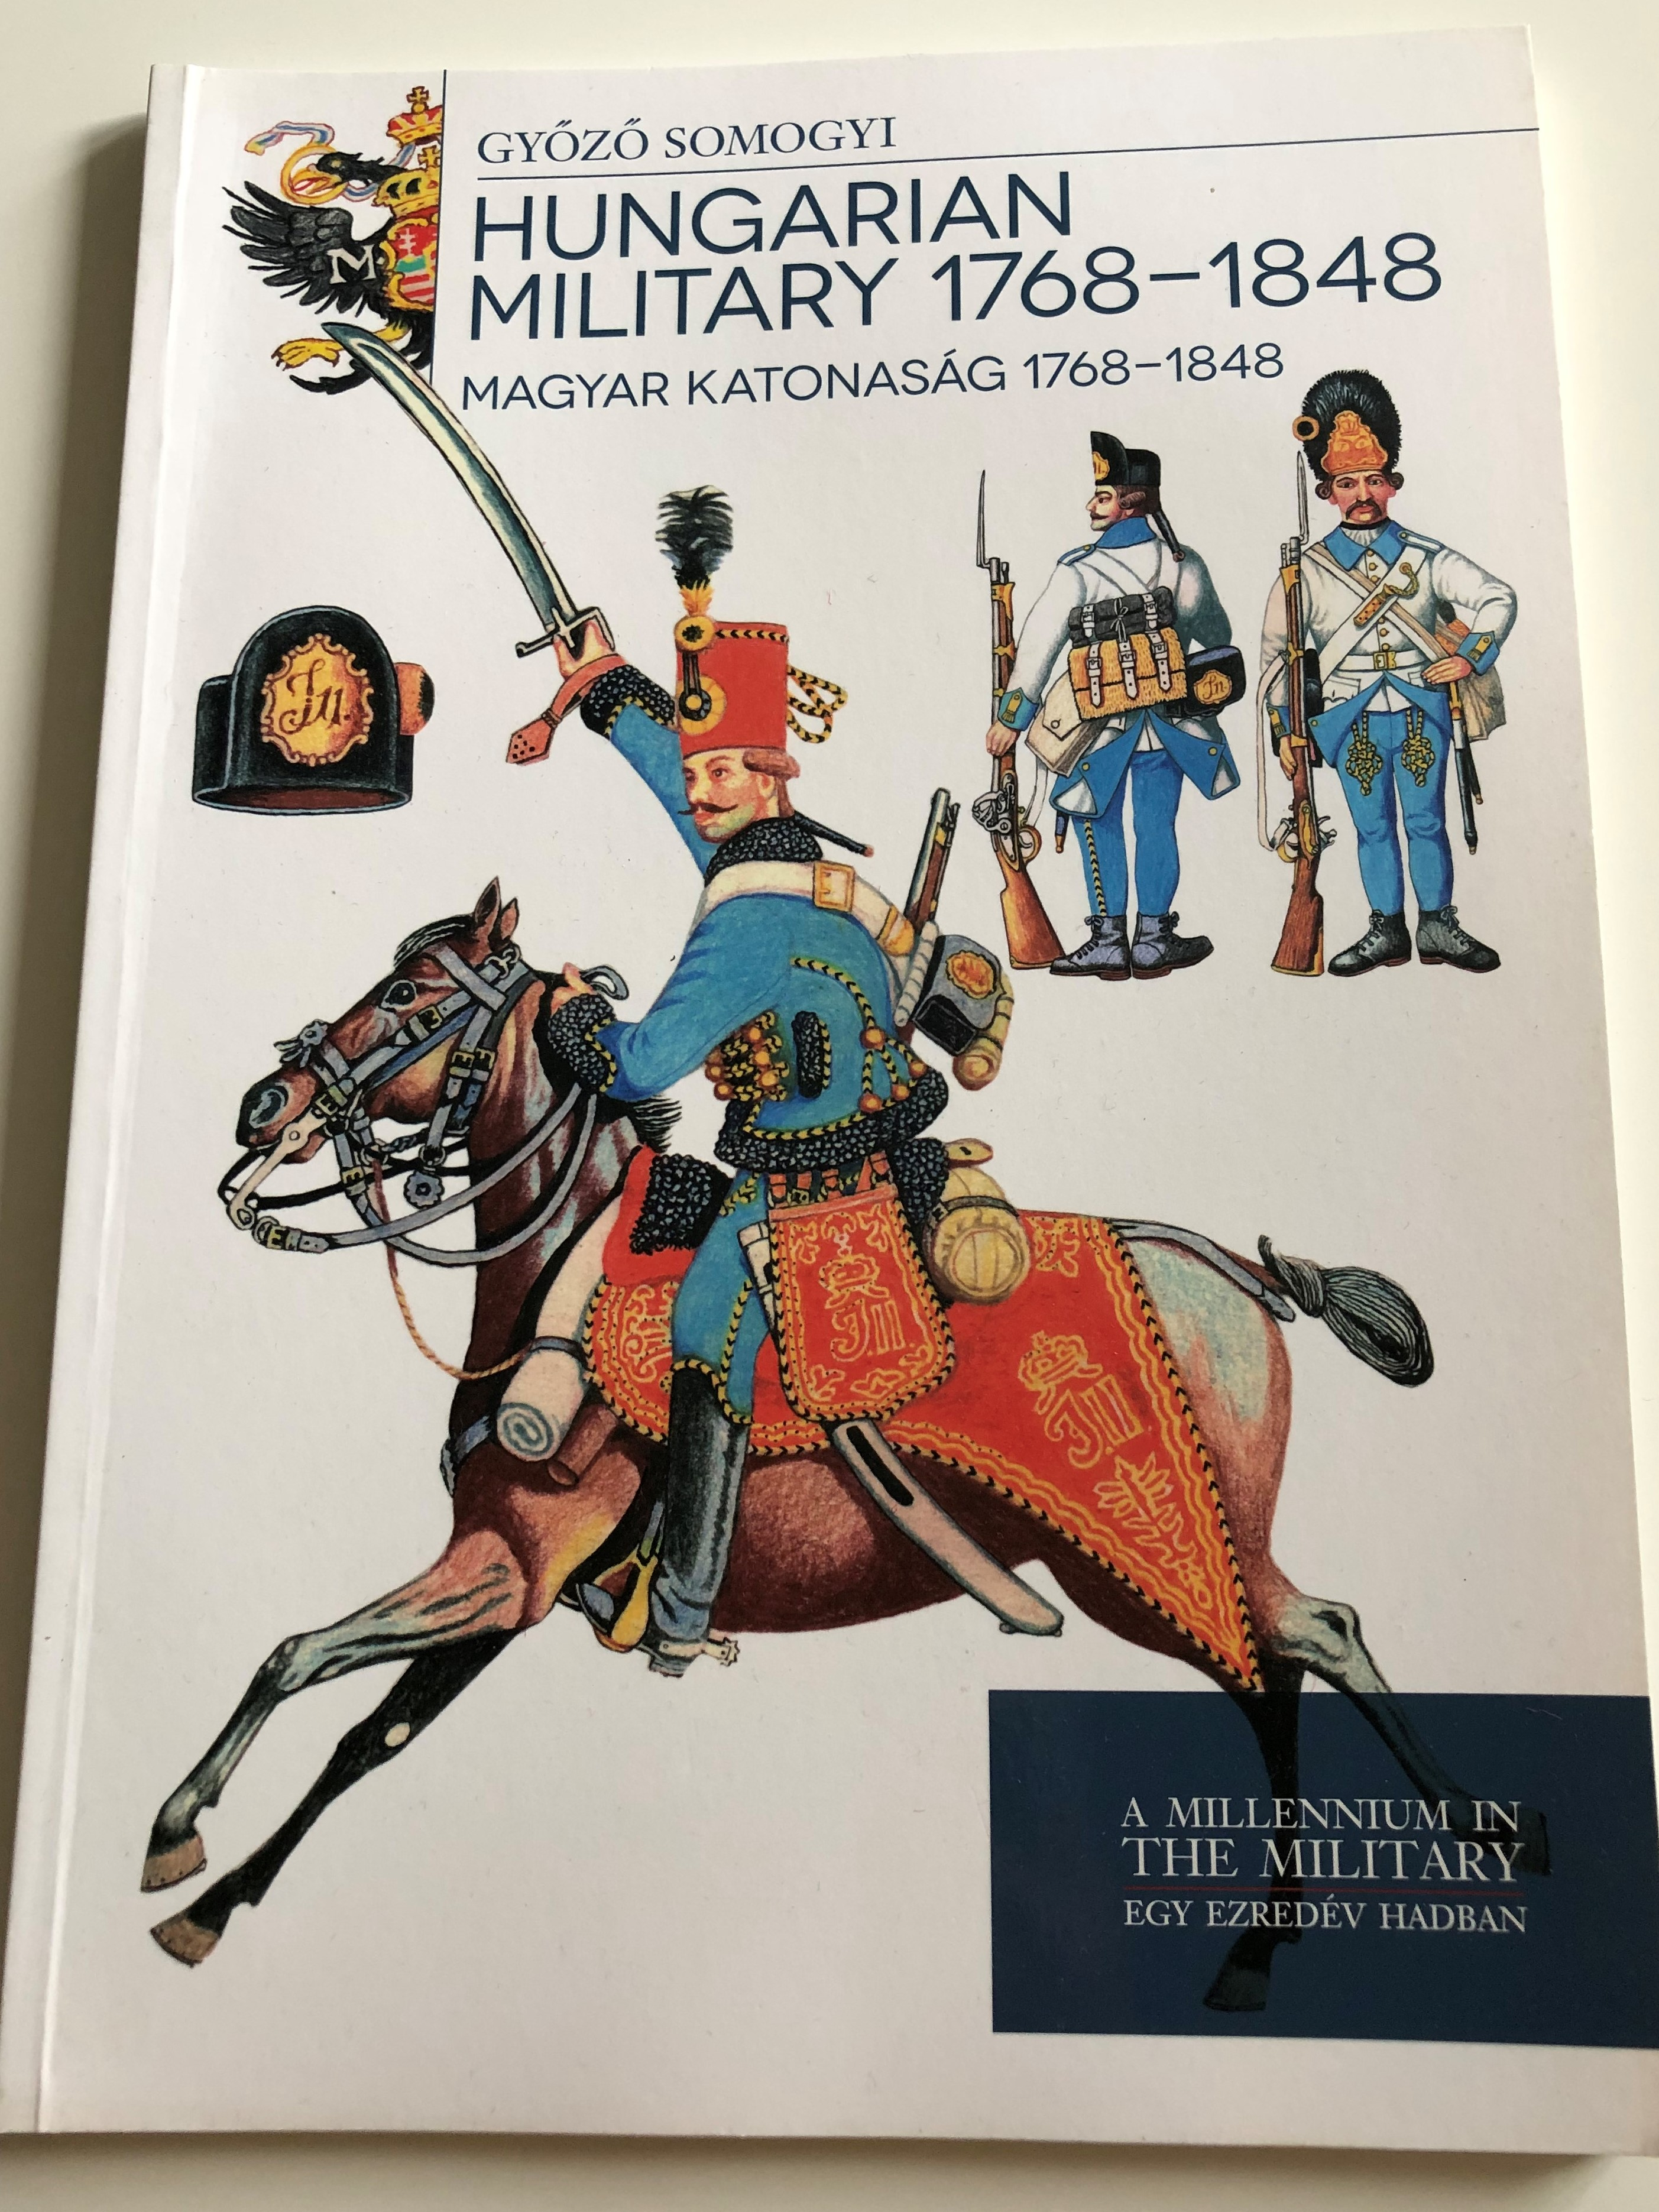 hungarian-military-1768-1848-by-gy-z-somogyi-magyar-katonas-g-1768-1848-a-millennium-in-the-military-egy-ezred-v-hadban-paperback-2013-hm-zr-nyi-1-.jpg